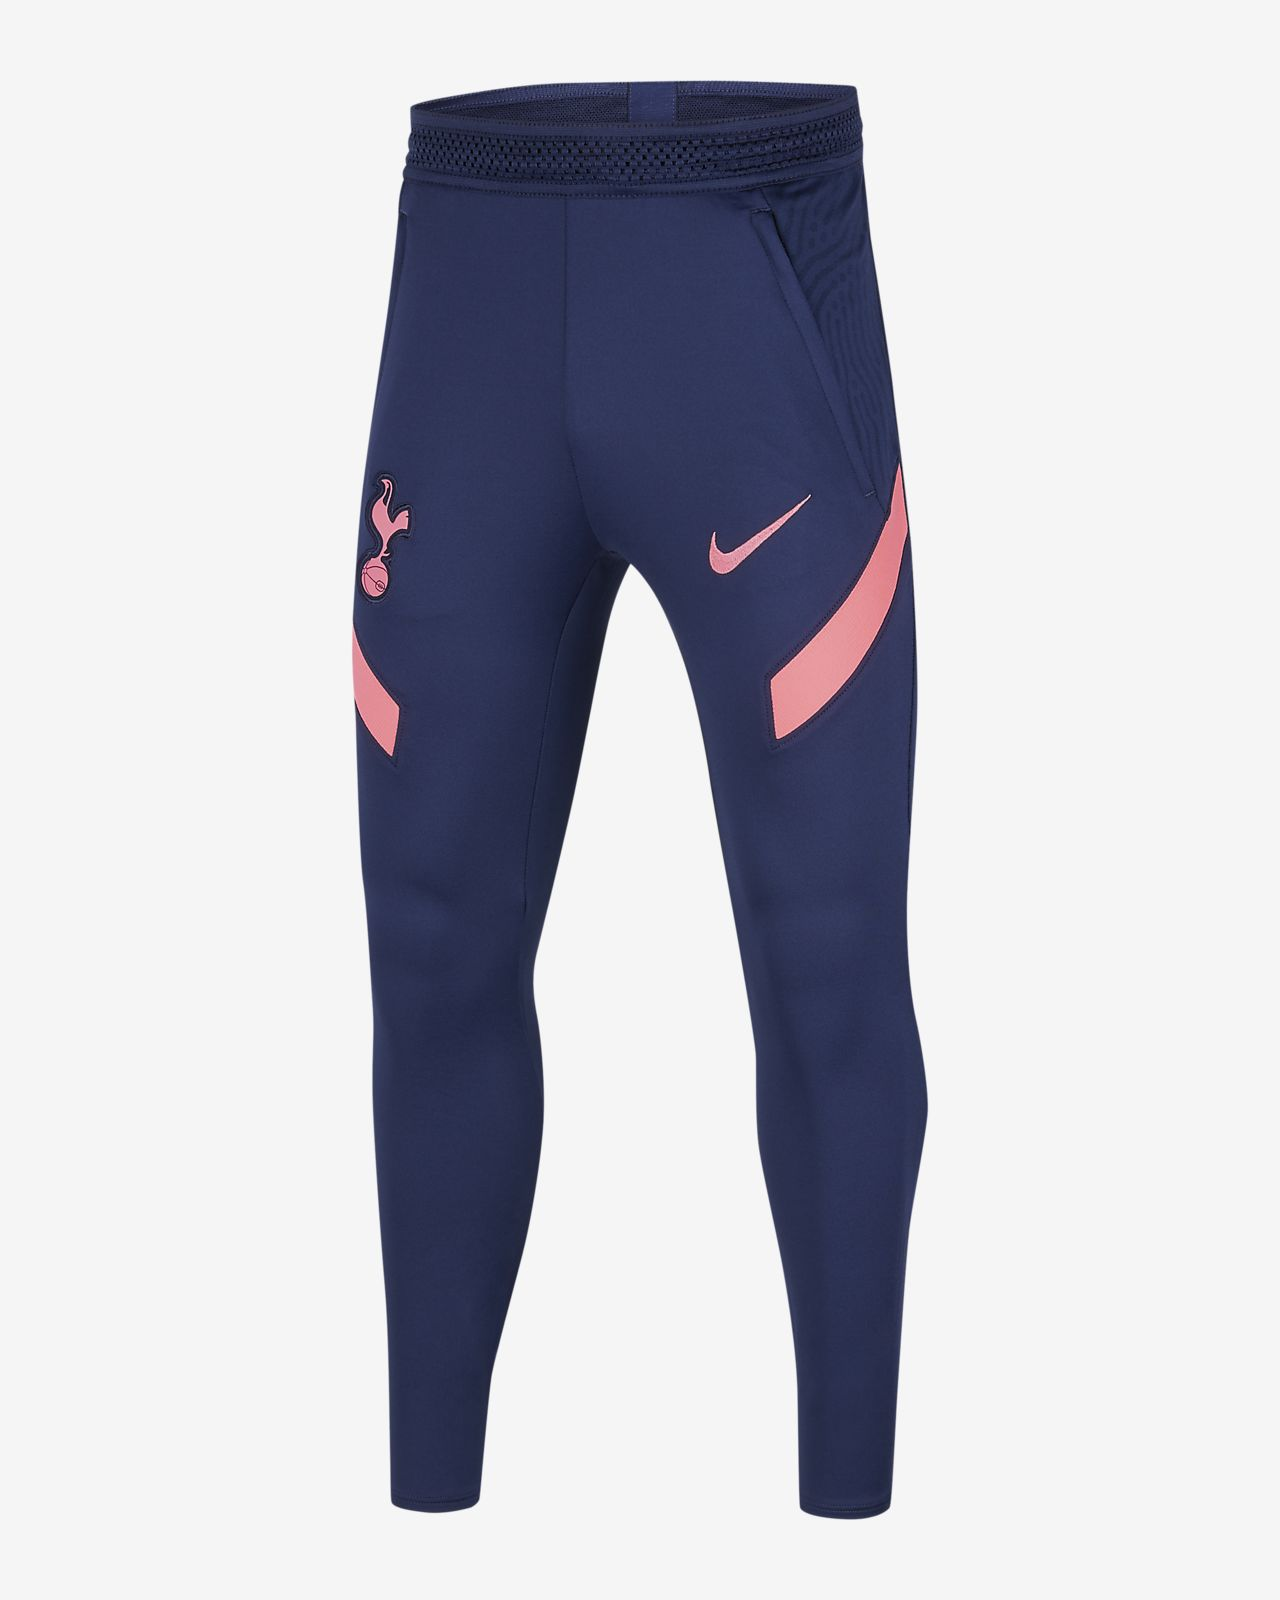 Pantalones de fútbol para niños talla grande Tottenham Hotspur Strike